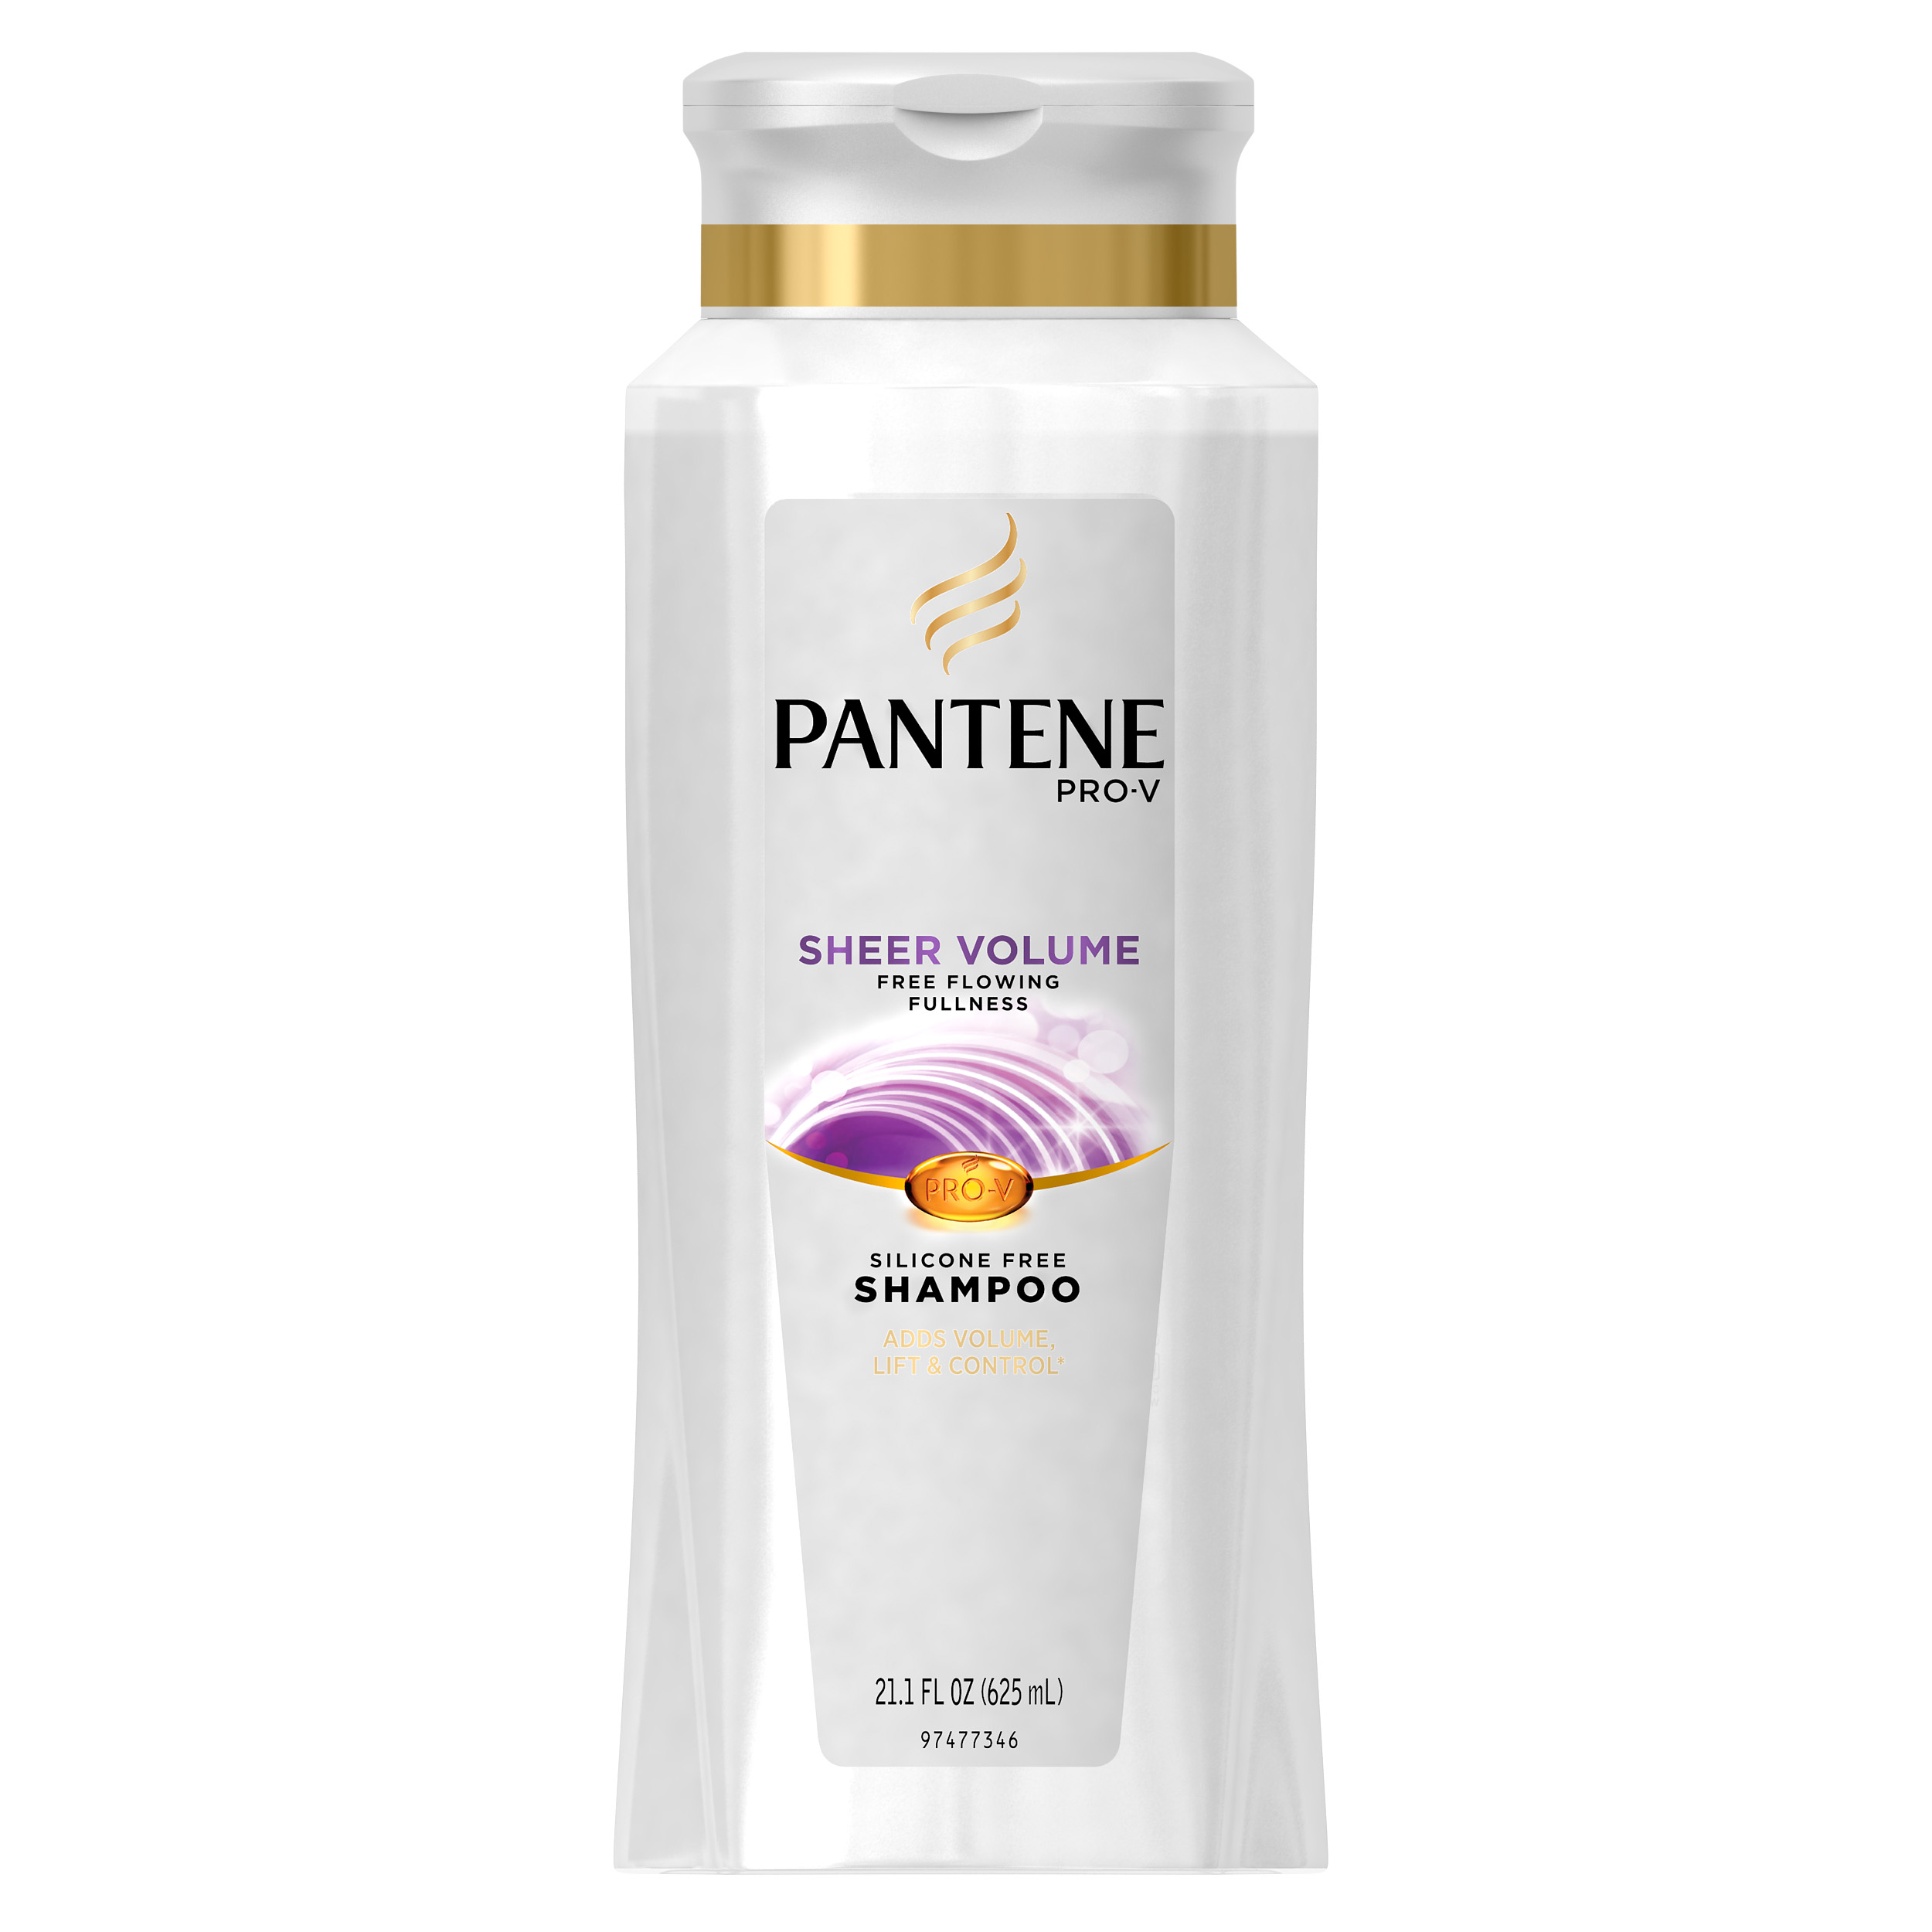 Pantene Pro-V Sheer Volume Shampoo, 21.1 fl oz